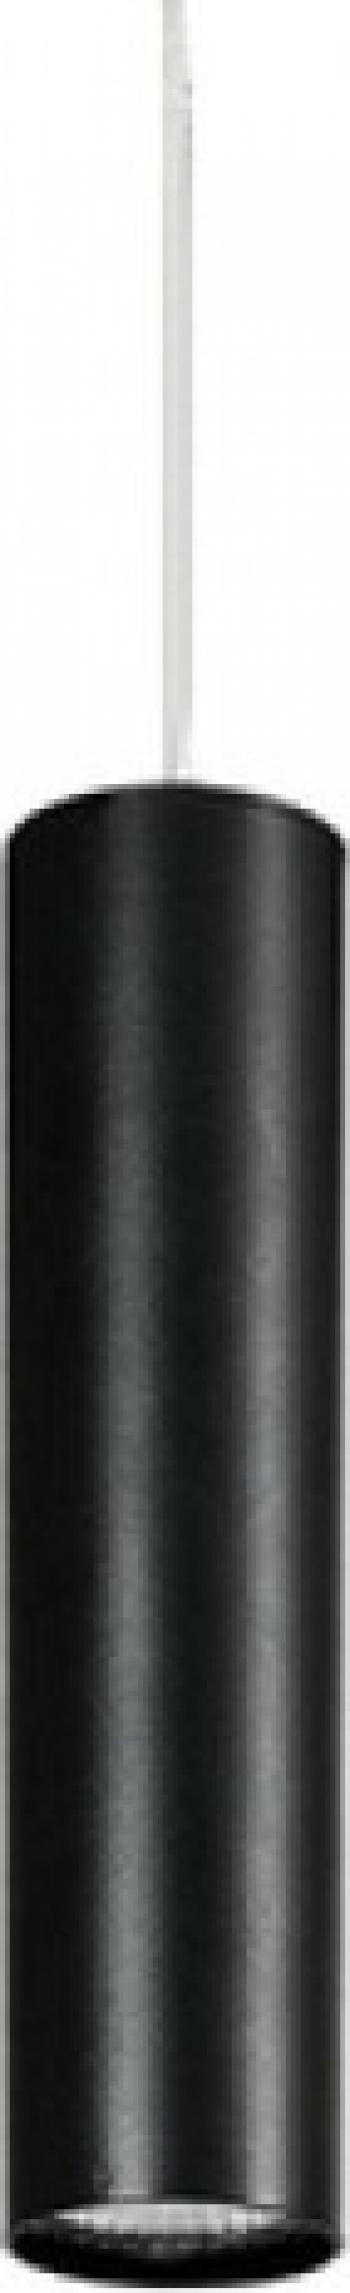 LUSTRA POLY M 8881 Corpuri de iluminat